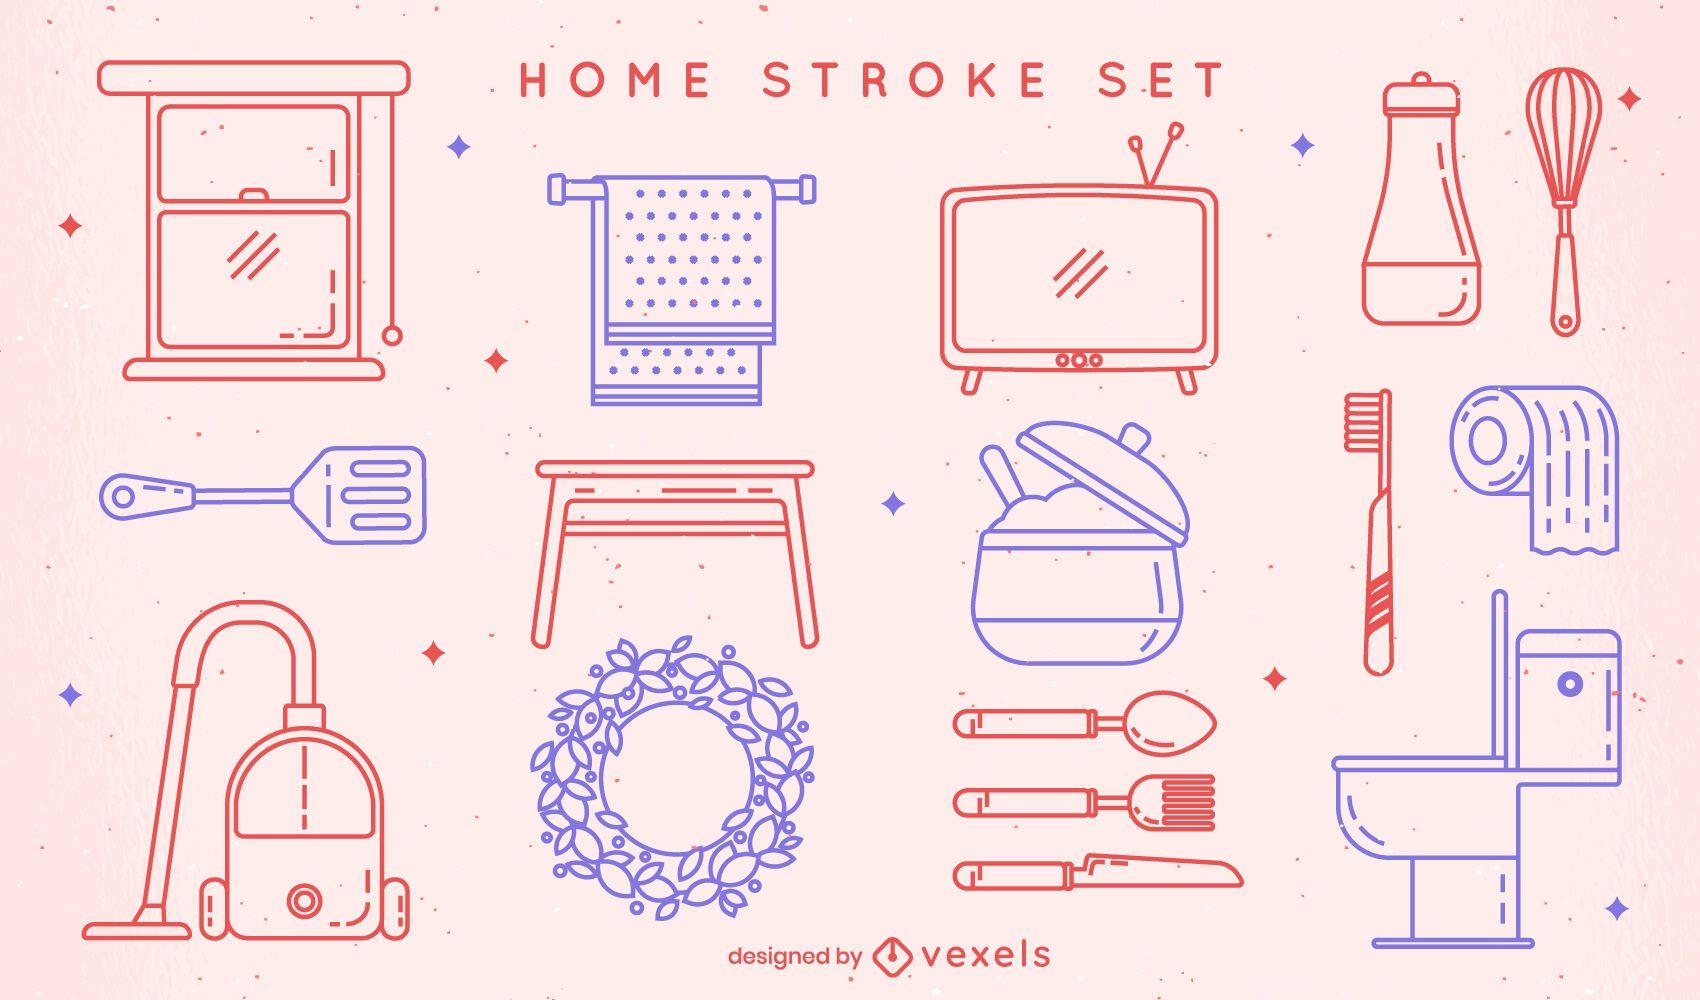 Set of home stroke elements